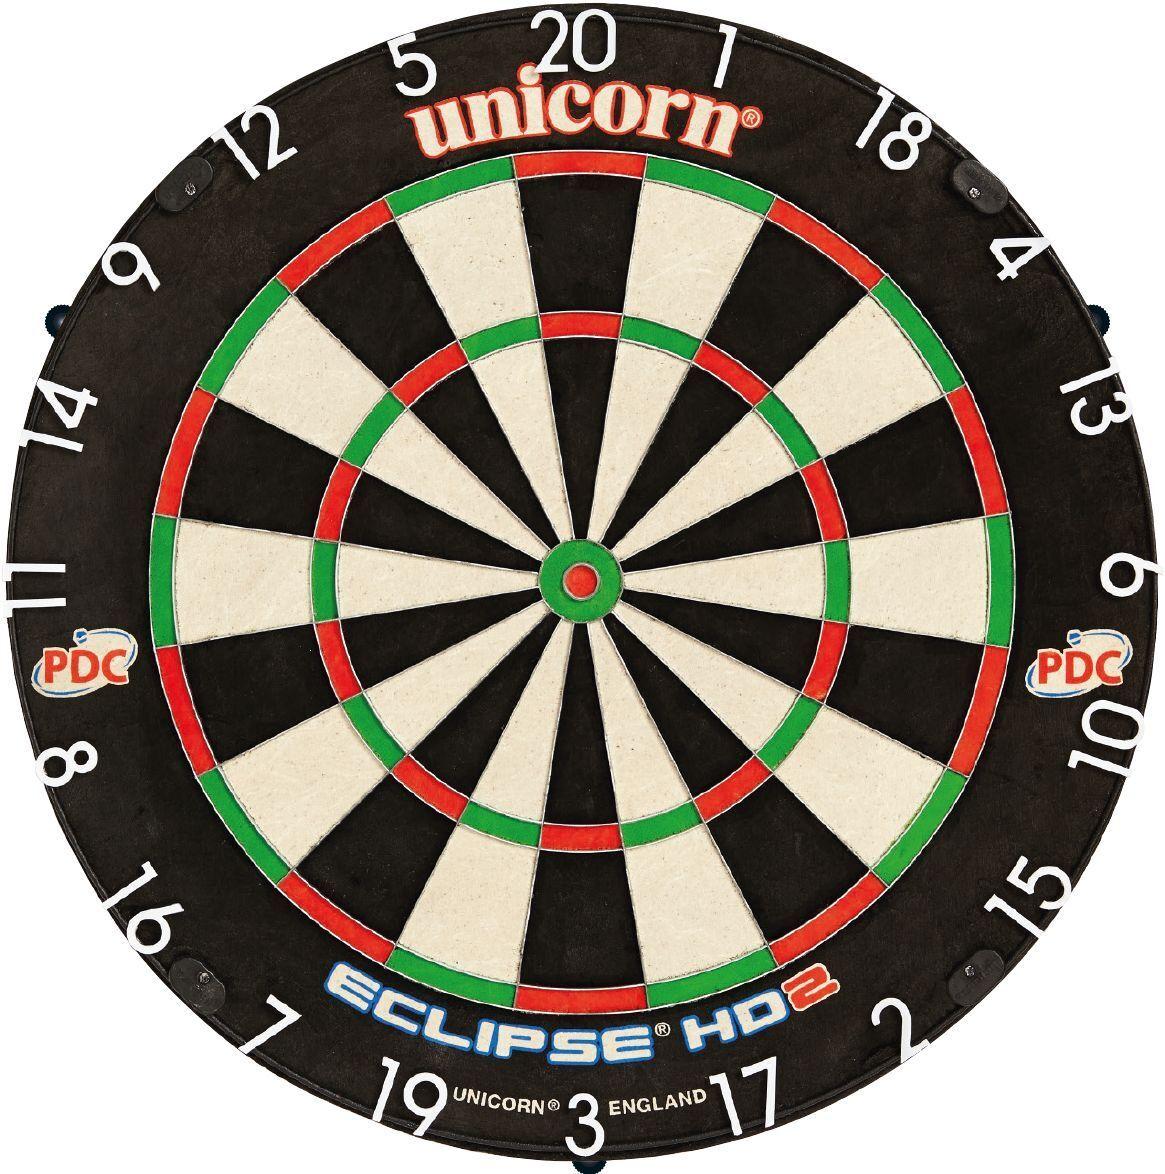 UNICORN UNICORN UNICORN Bristle Dart Board Dartboard Eclipse Pro HD2 Pro Dartscheibe Sisal 79890 231cfe